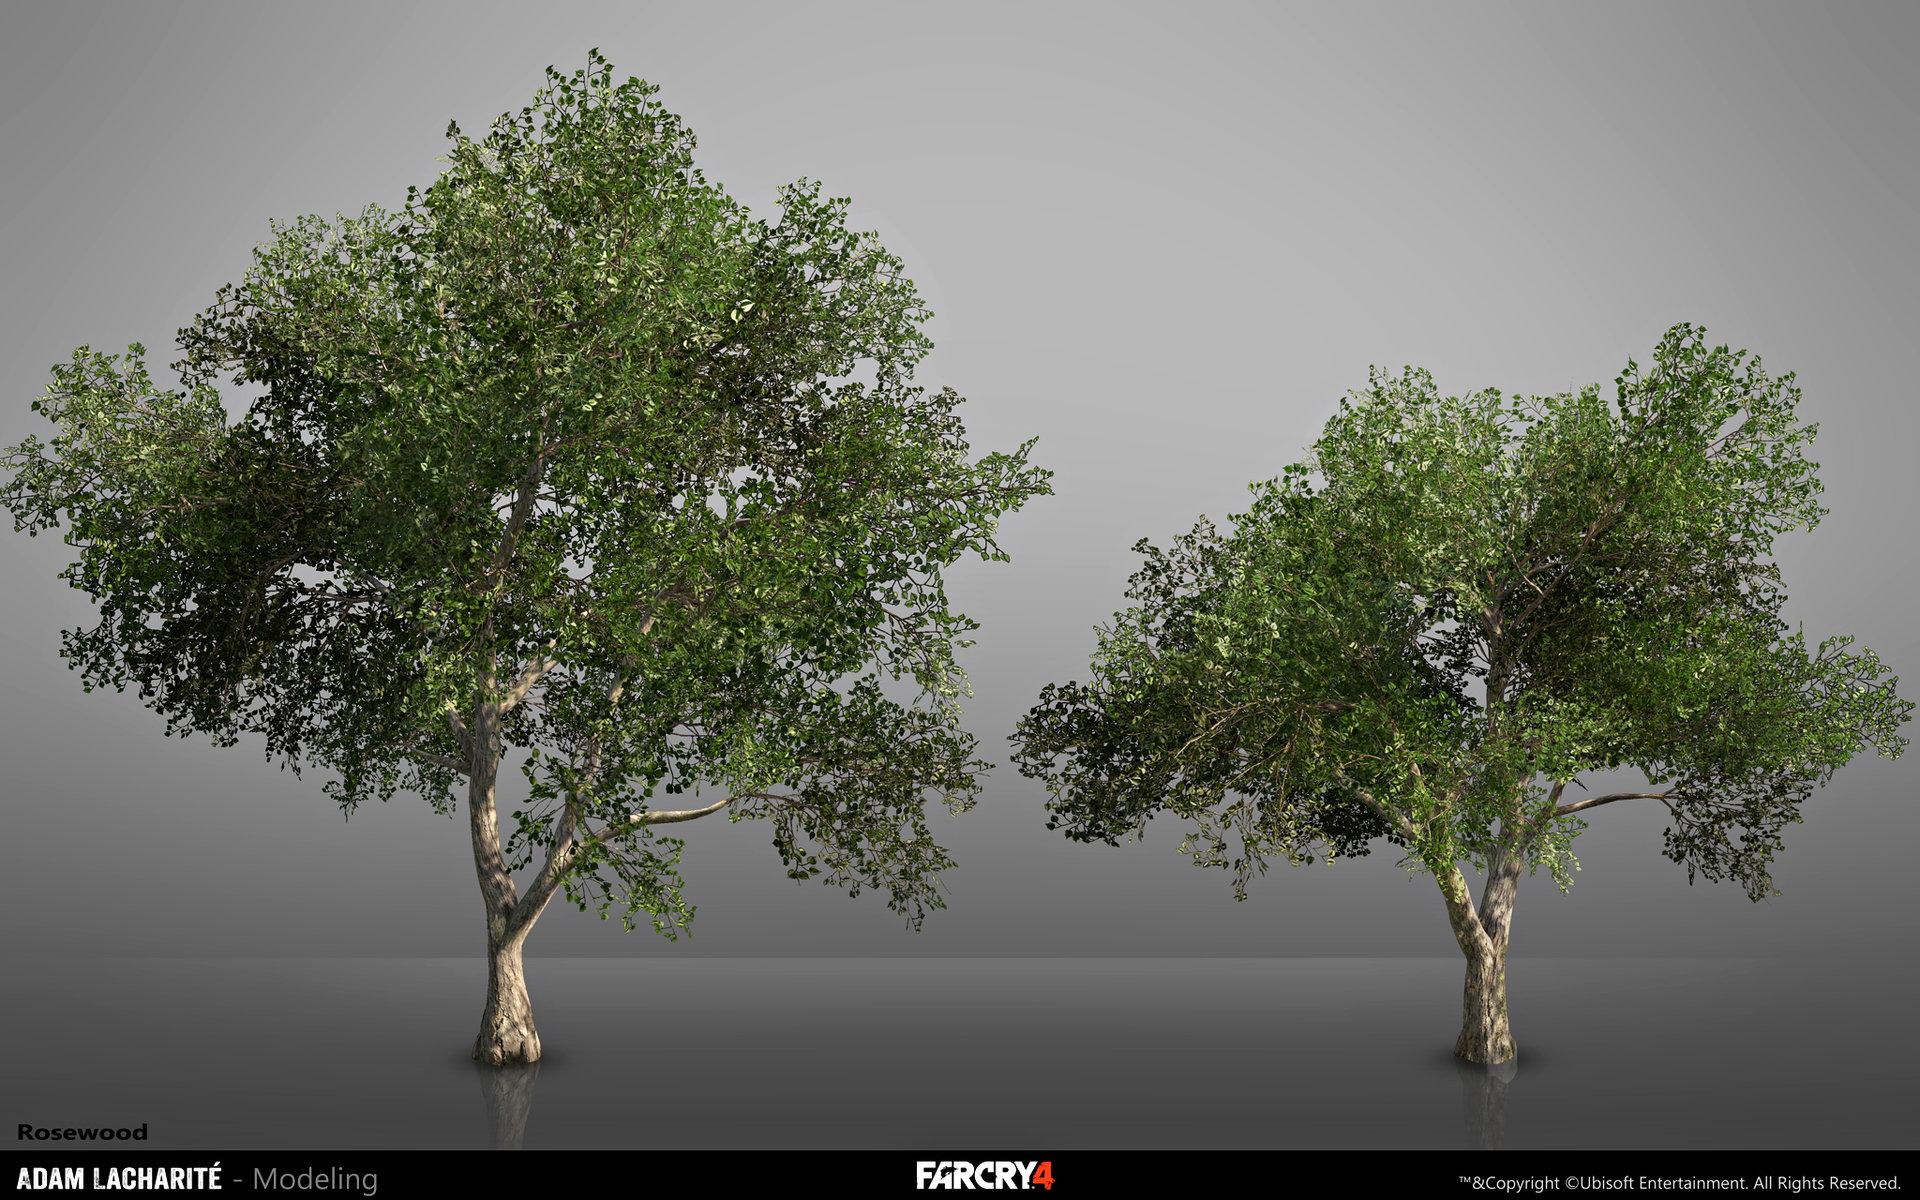 adam-lacharite-lefebvre-fc4-rosewood-adamlacharite.jpg?1427147705